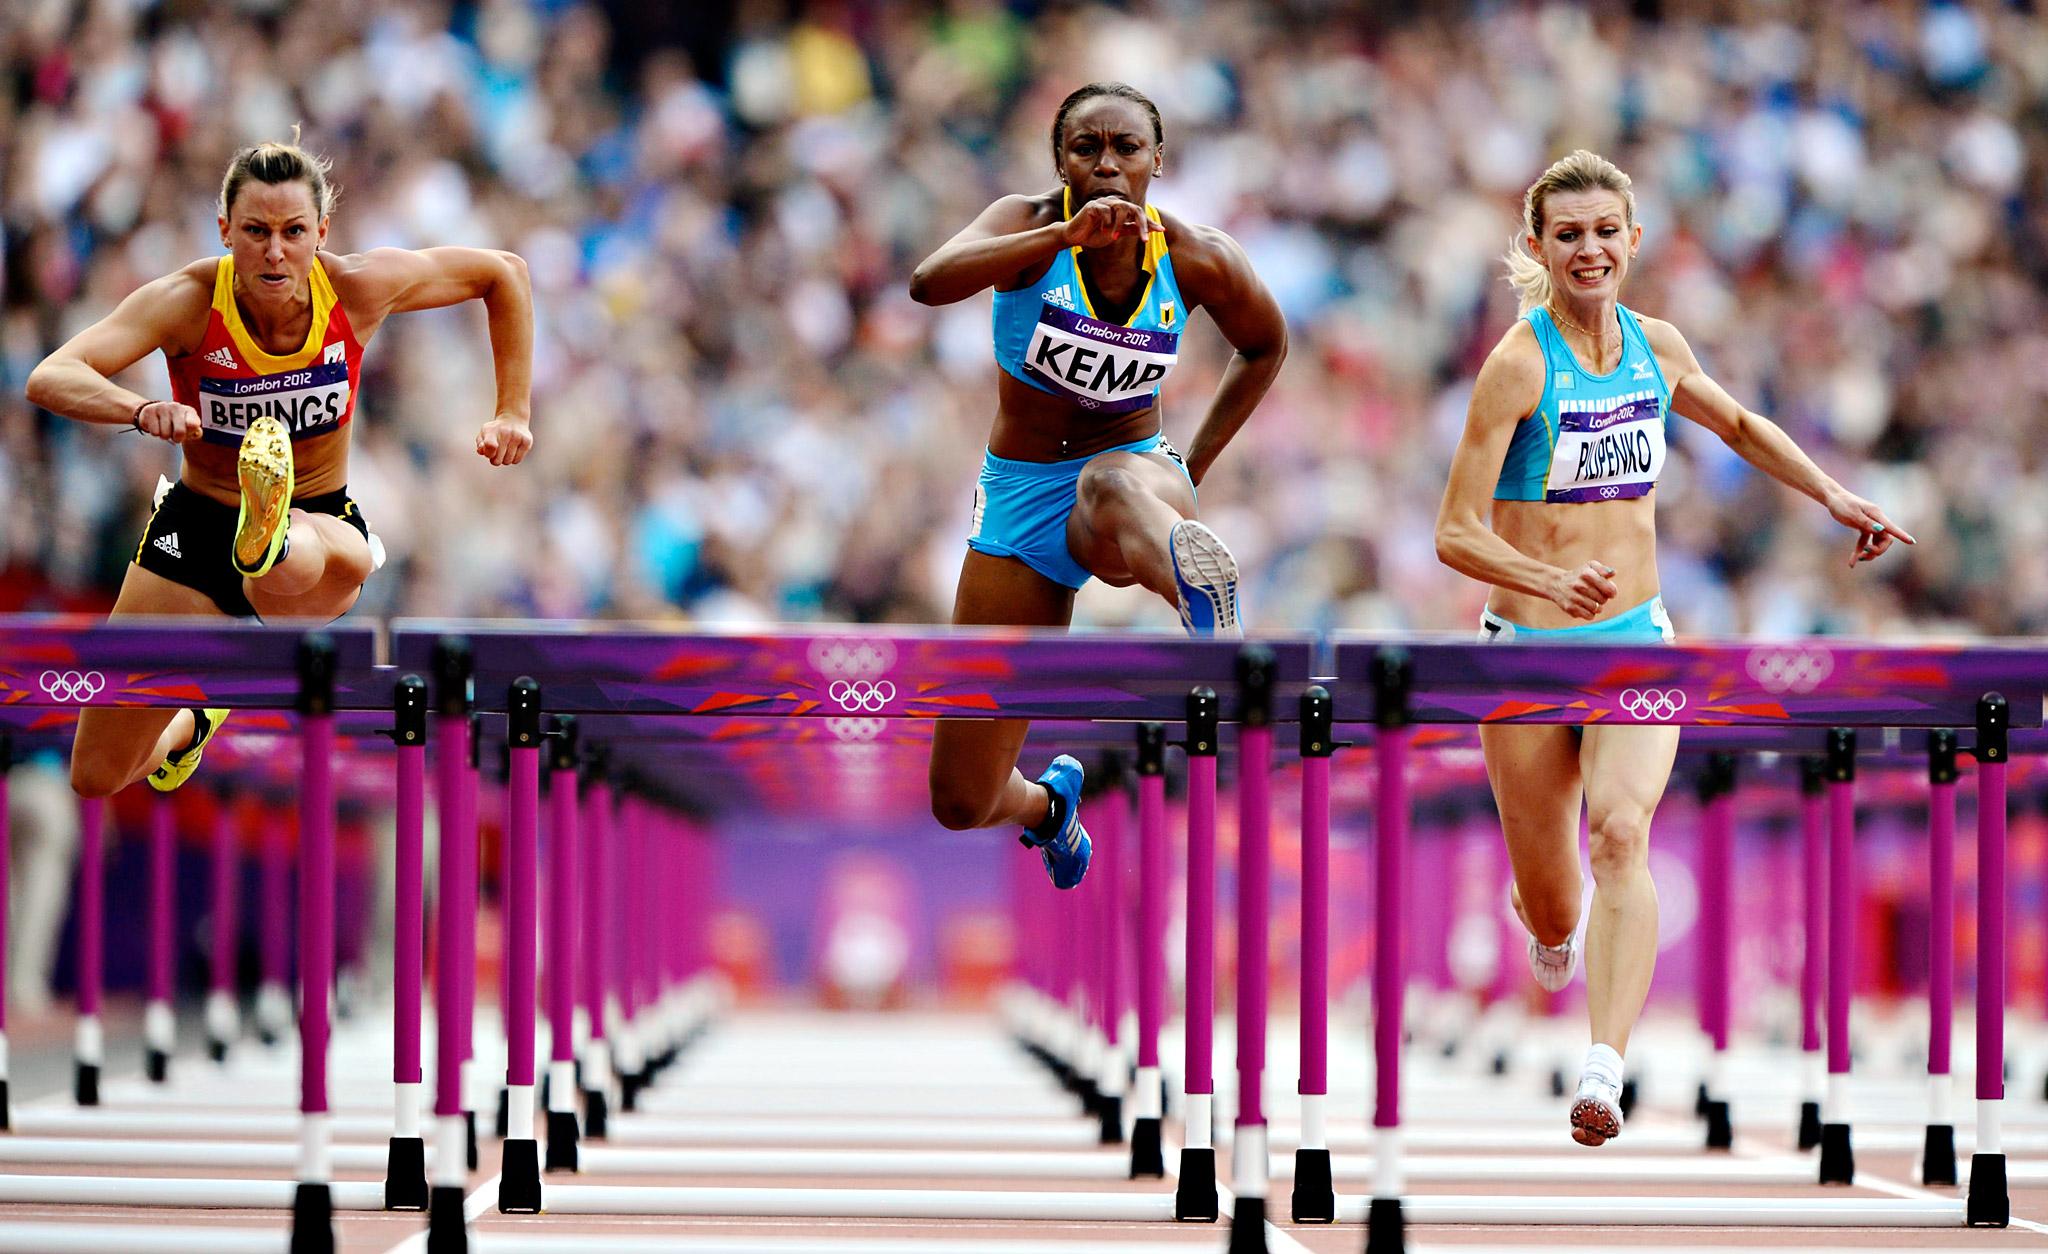 Women's 100m Hurdles Heats